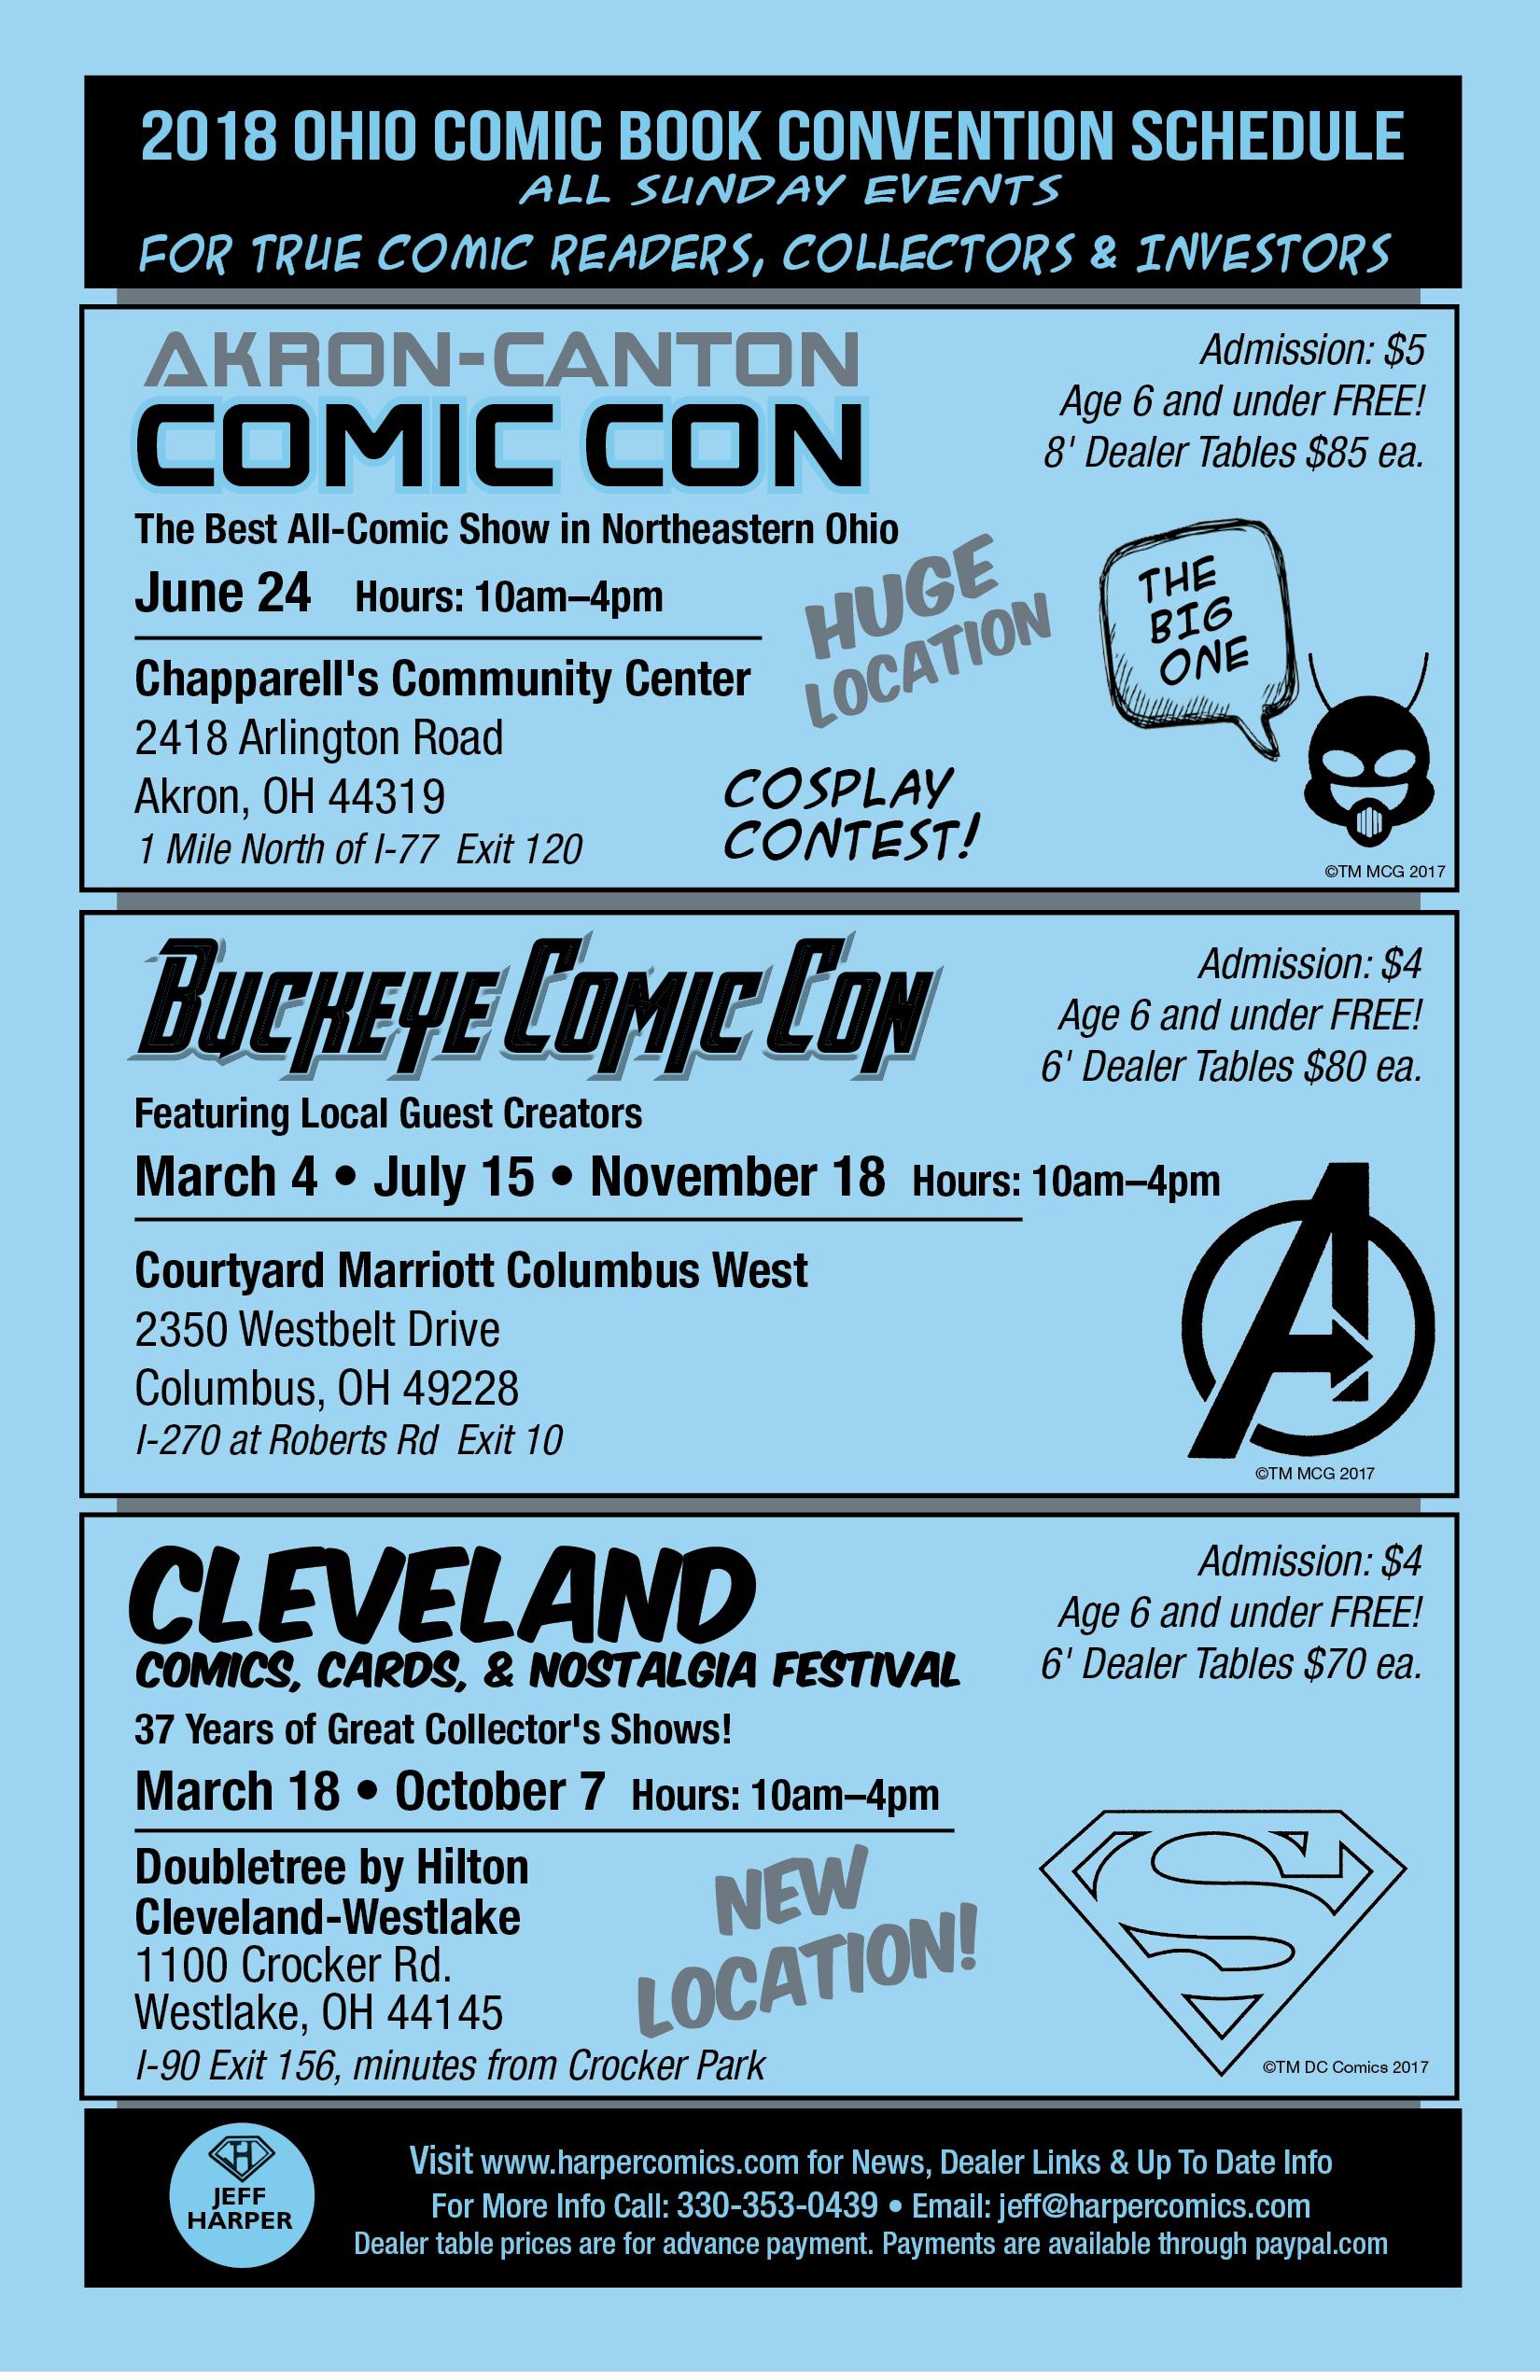 2018 Ohio Comic Book Show Schedule